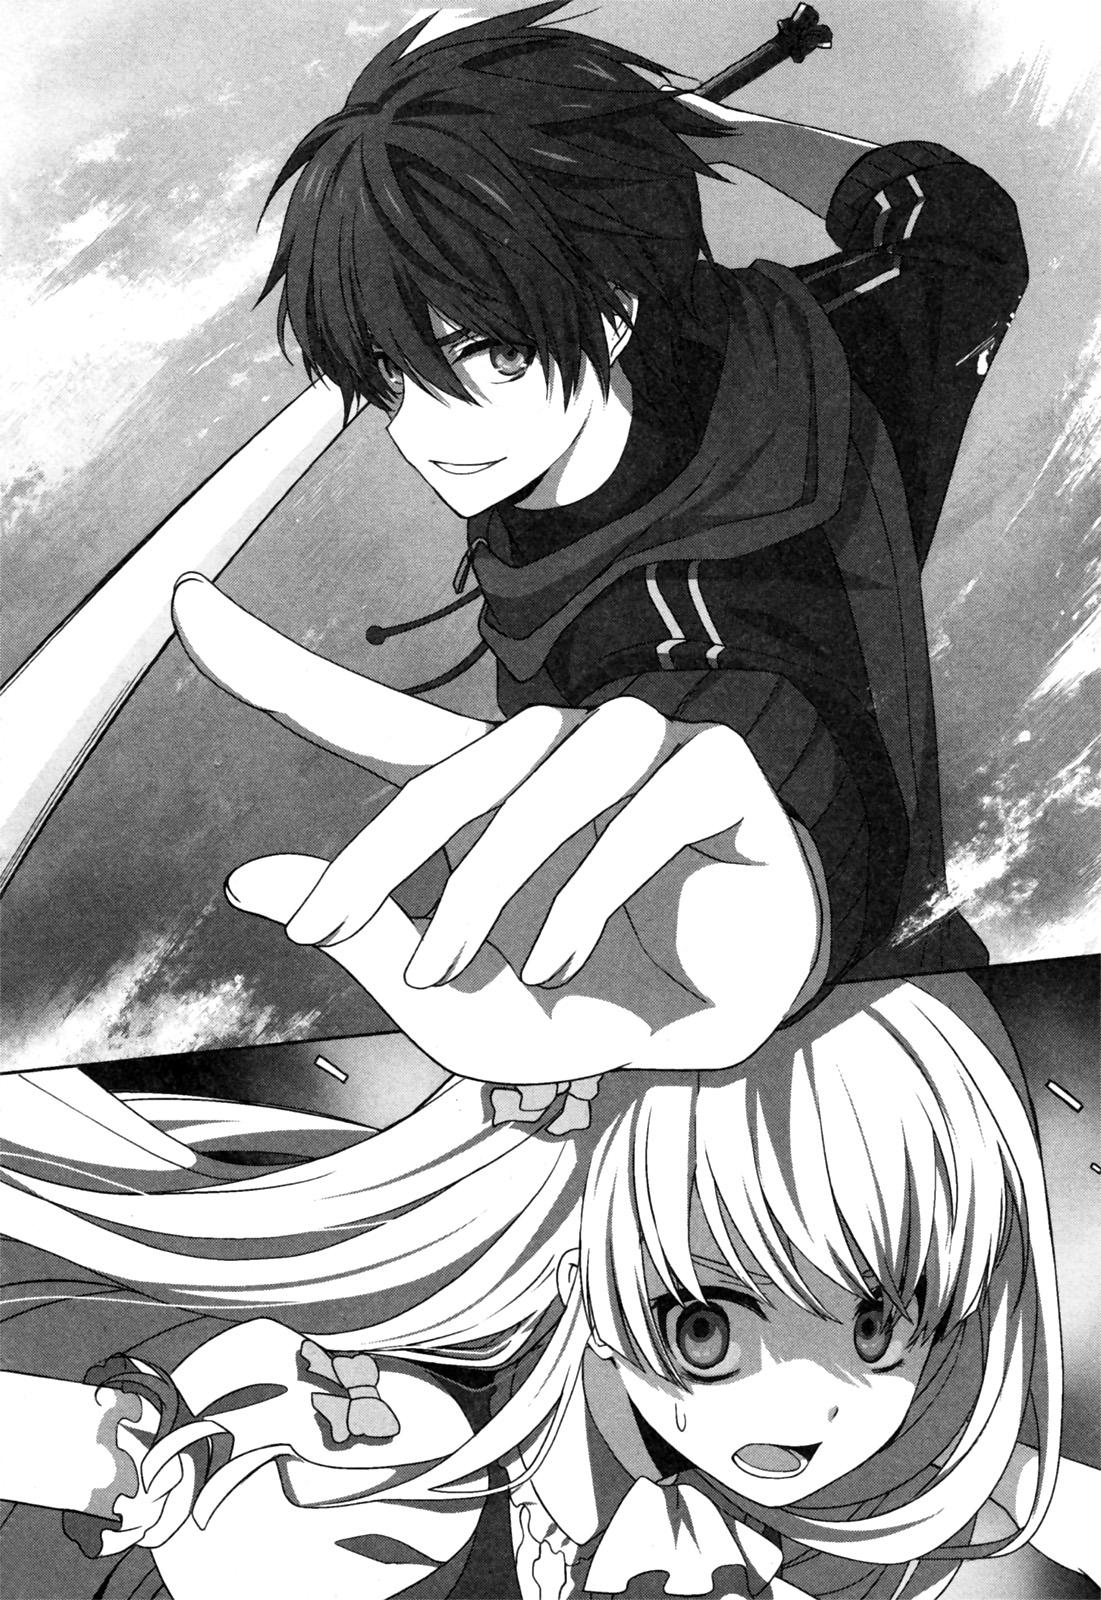 Mitou Shoukan://Blood-Sign - Tập 1 Chương 4